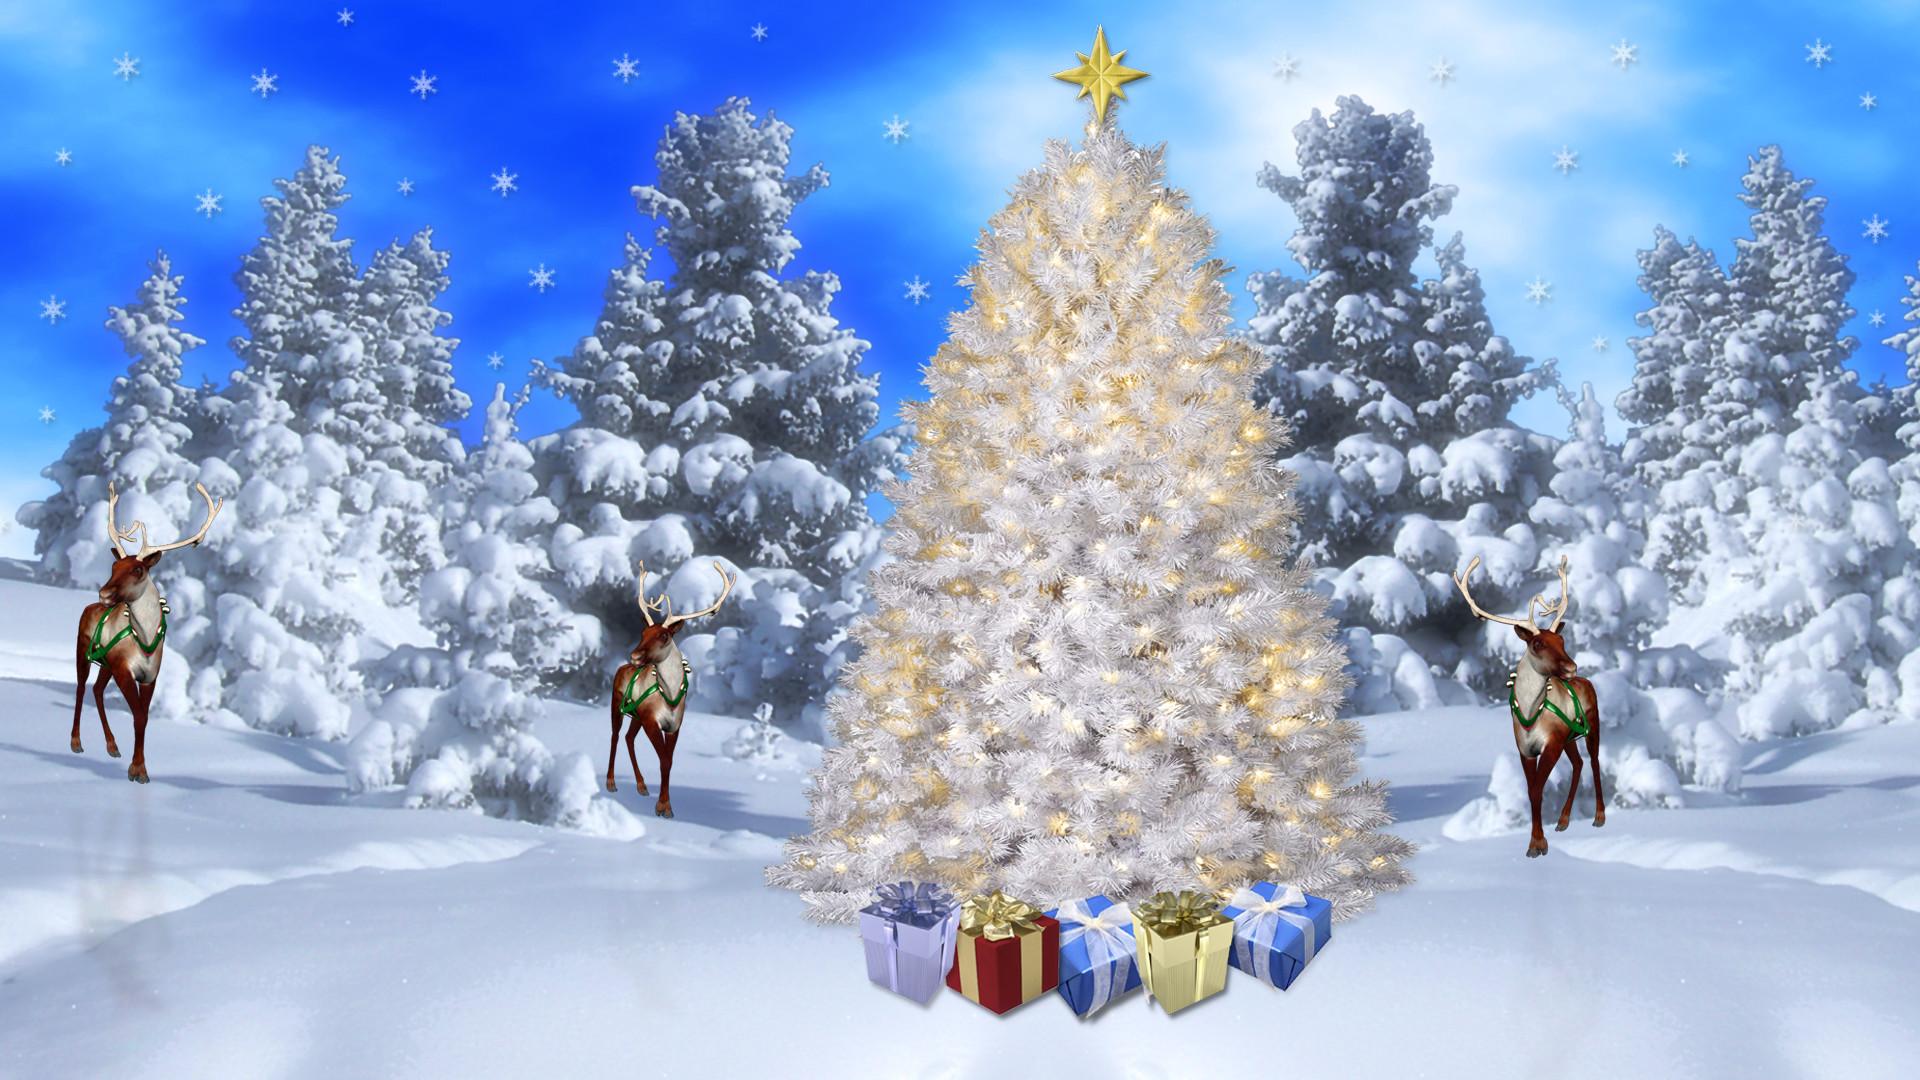 christmas wallpaper screensavers – www.wallpapers-in-hd.com